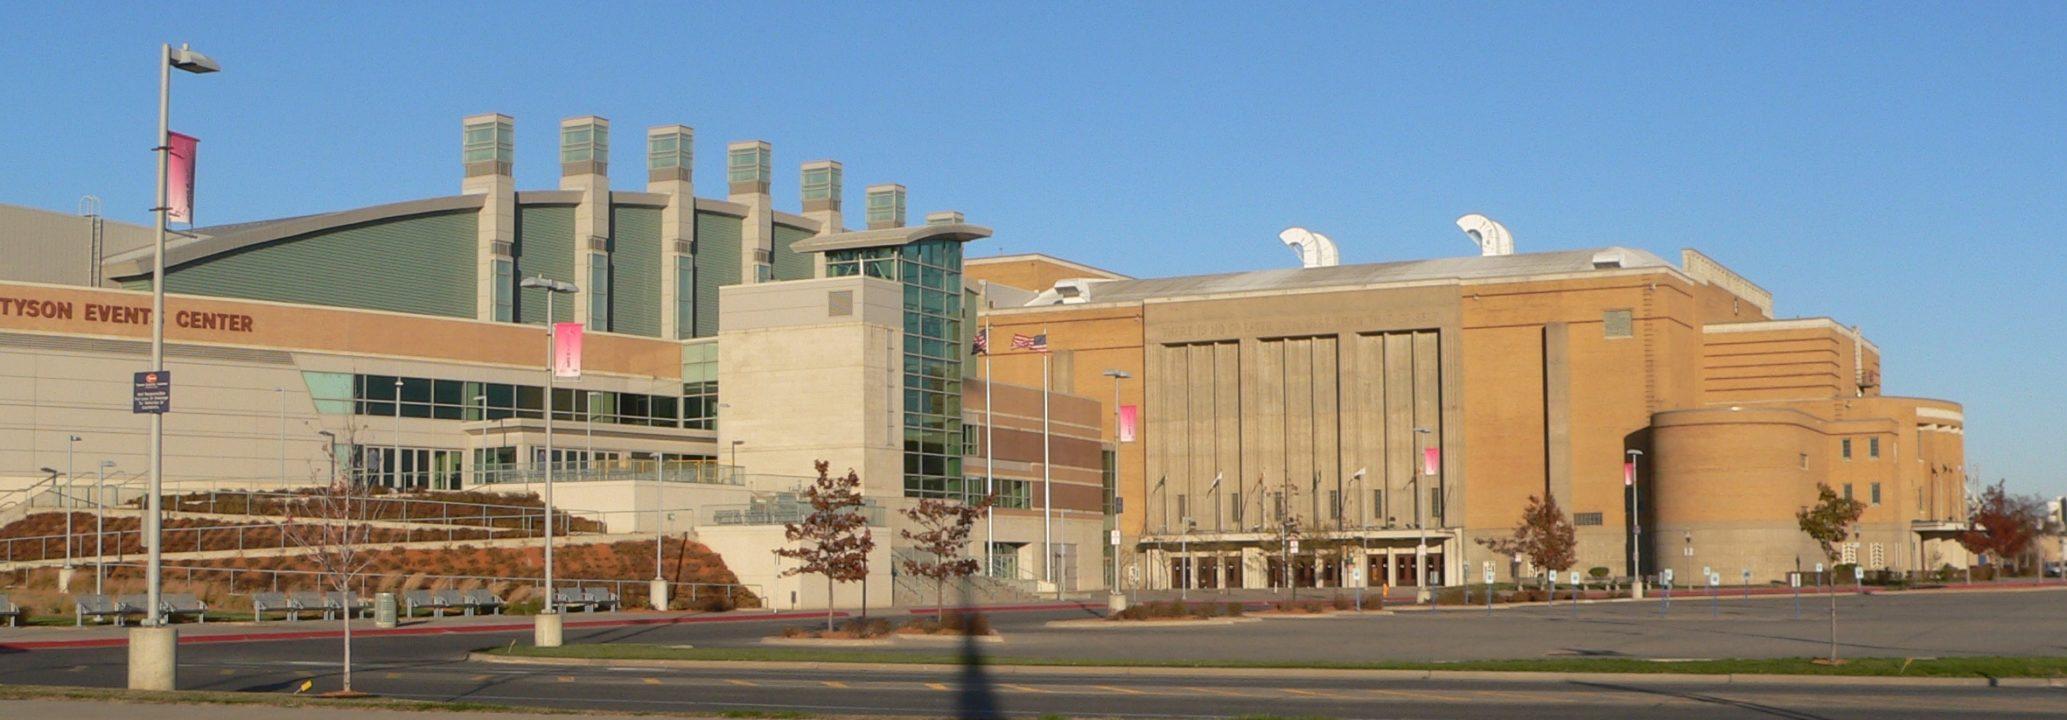 Sioux City, Iowa to Host NAIA National Championship Through 2020